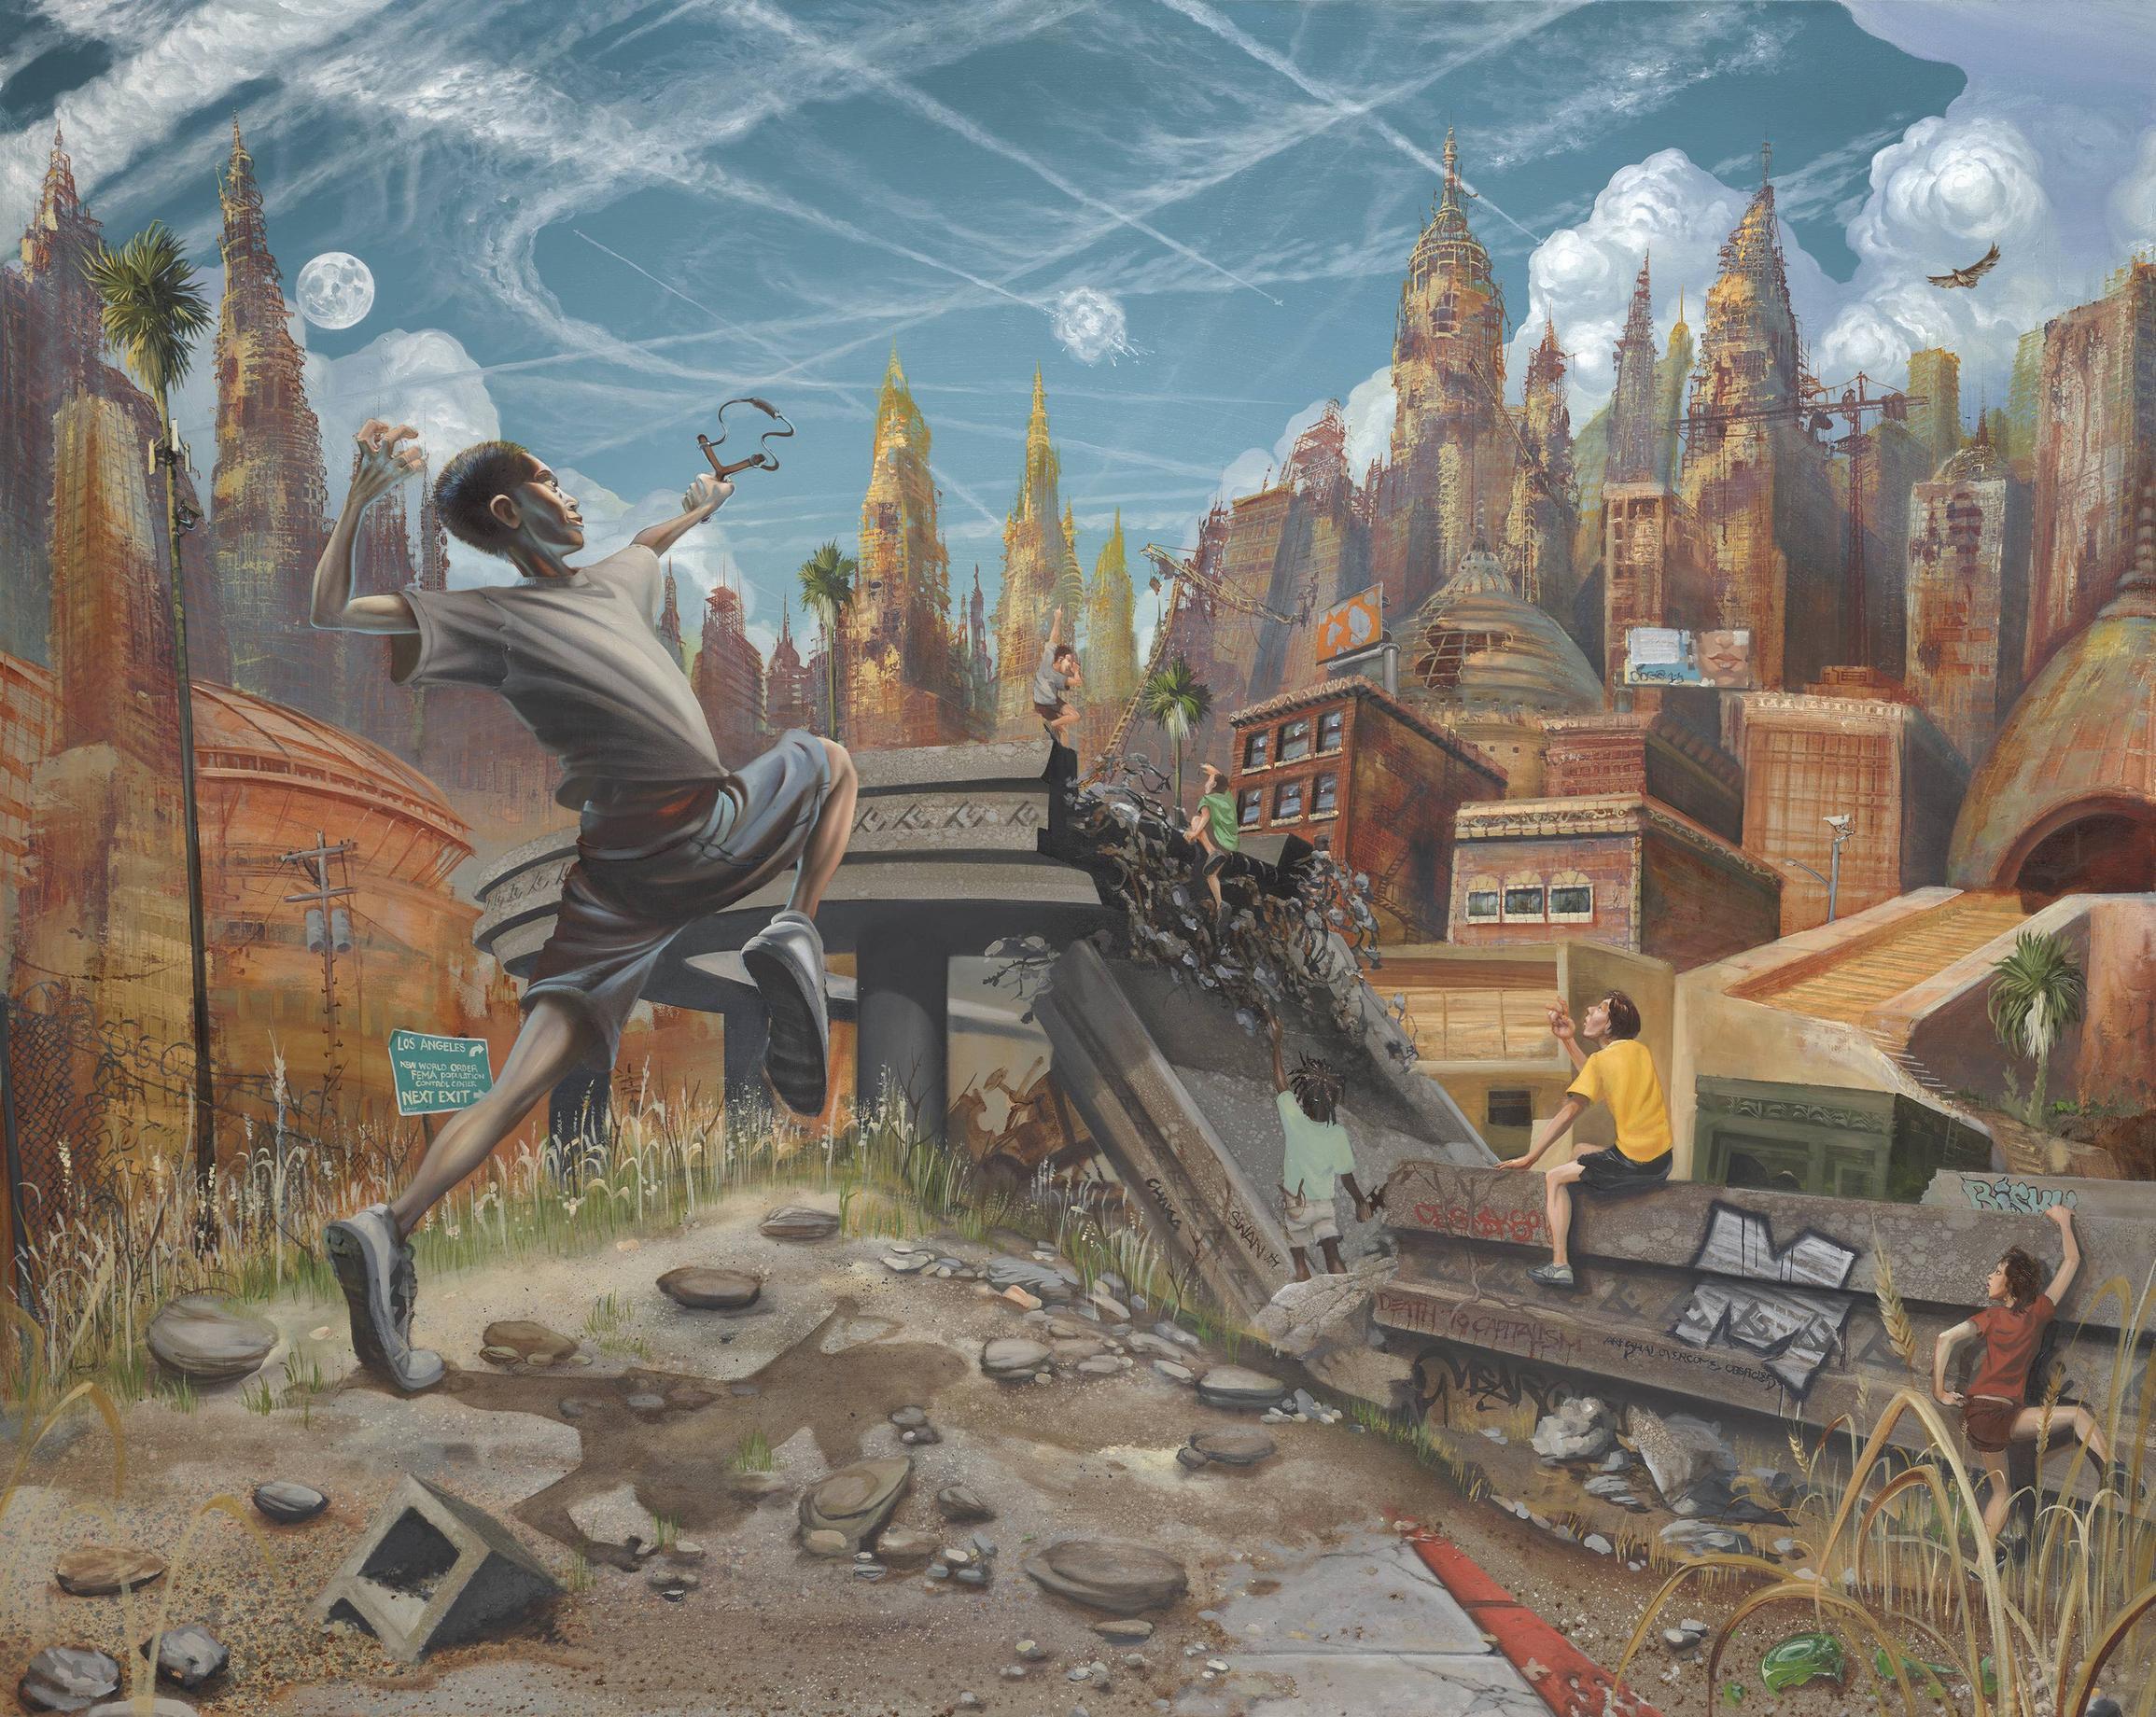 Freeport - David & Goliath 42/100